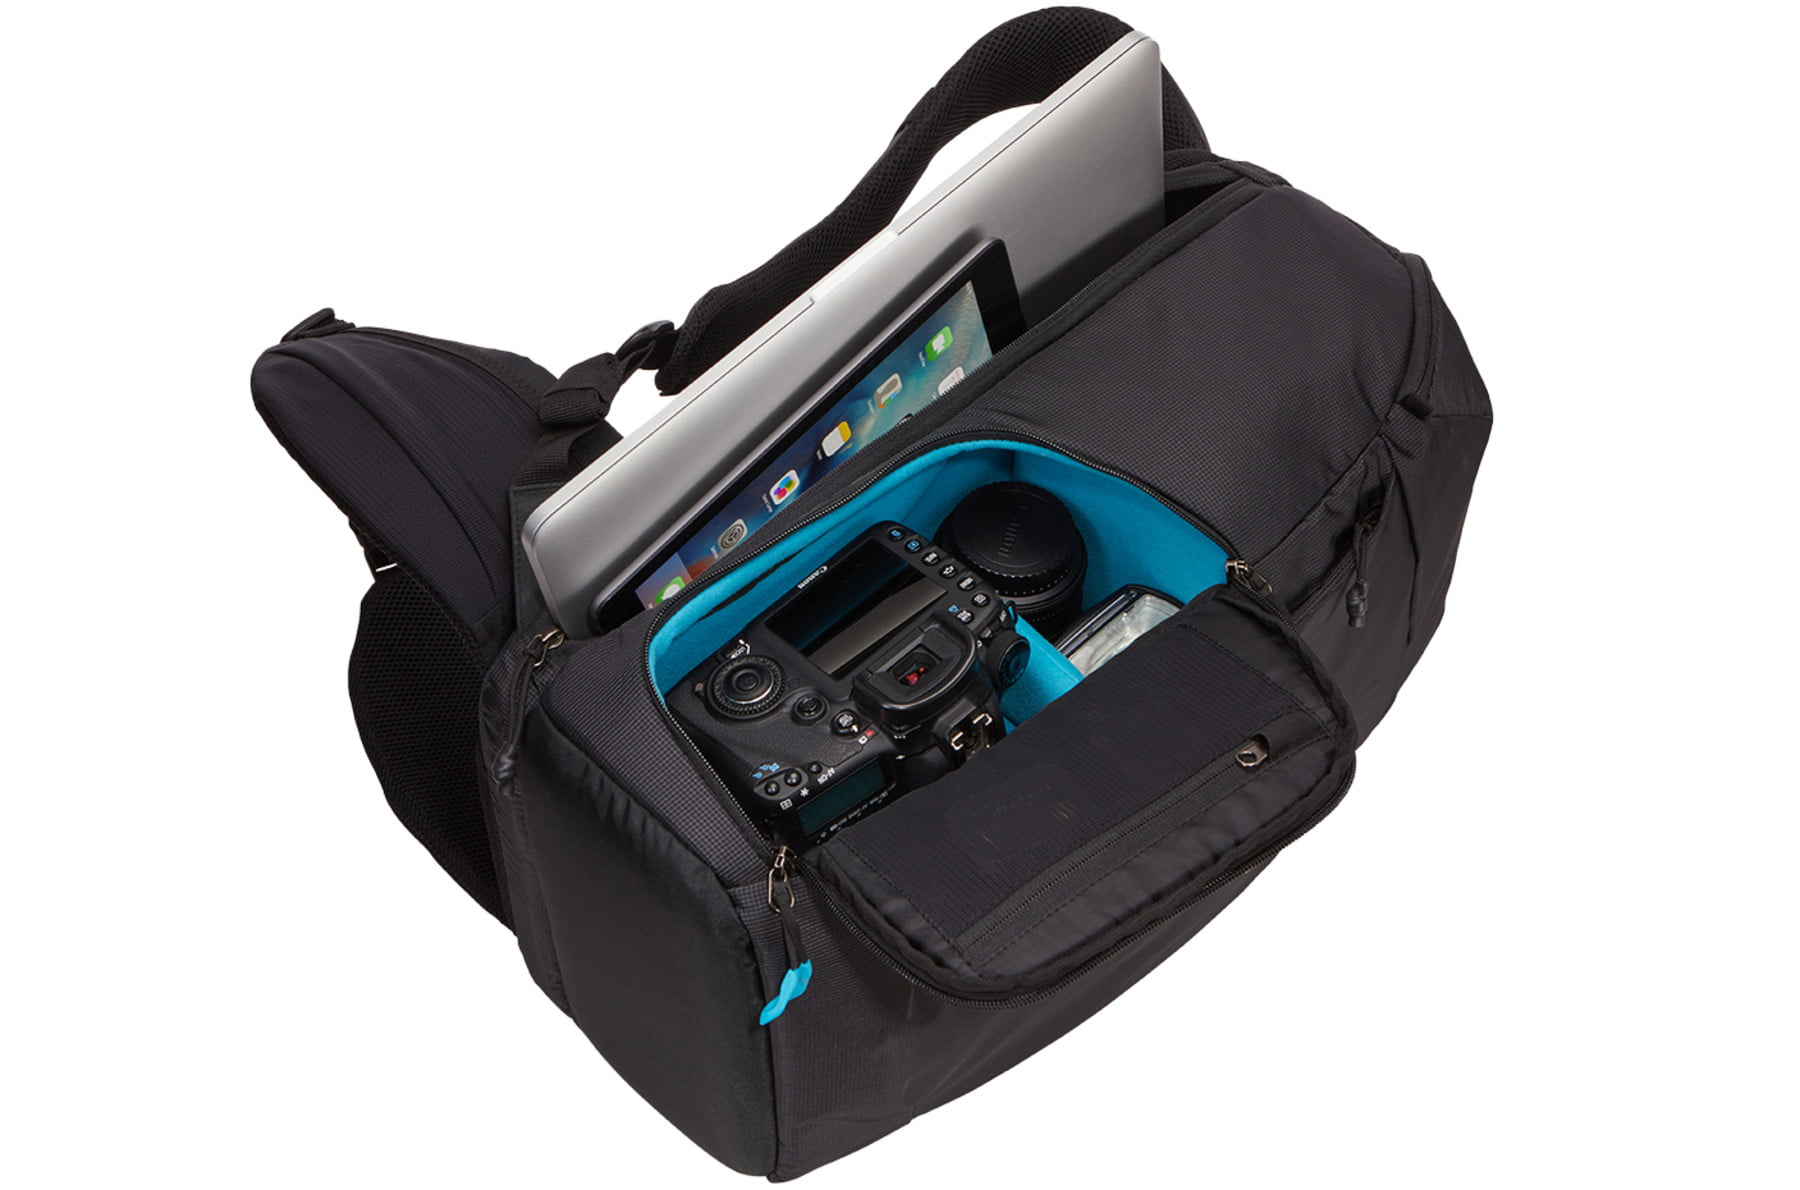 Rucsac foto Thule Aspect DSLR Backpack Negru 5